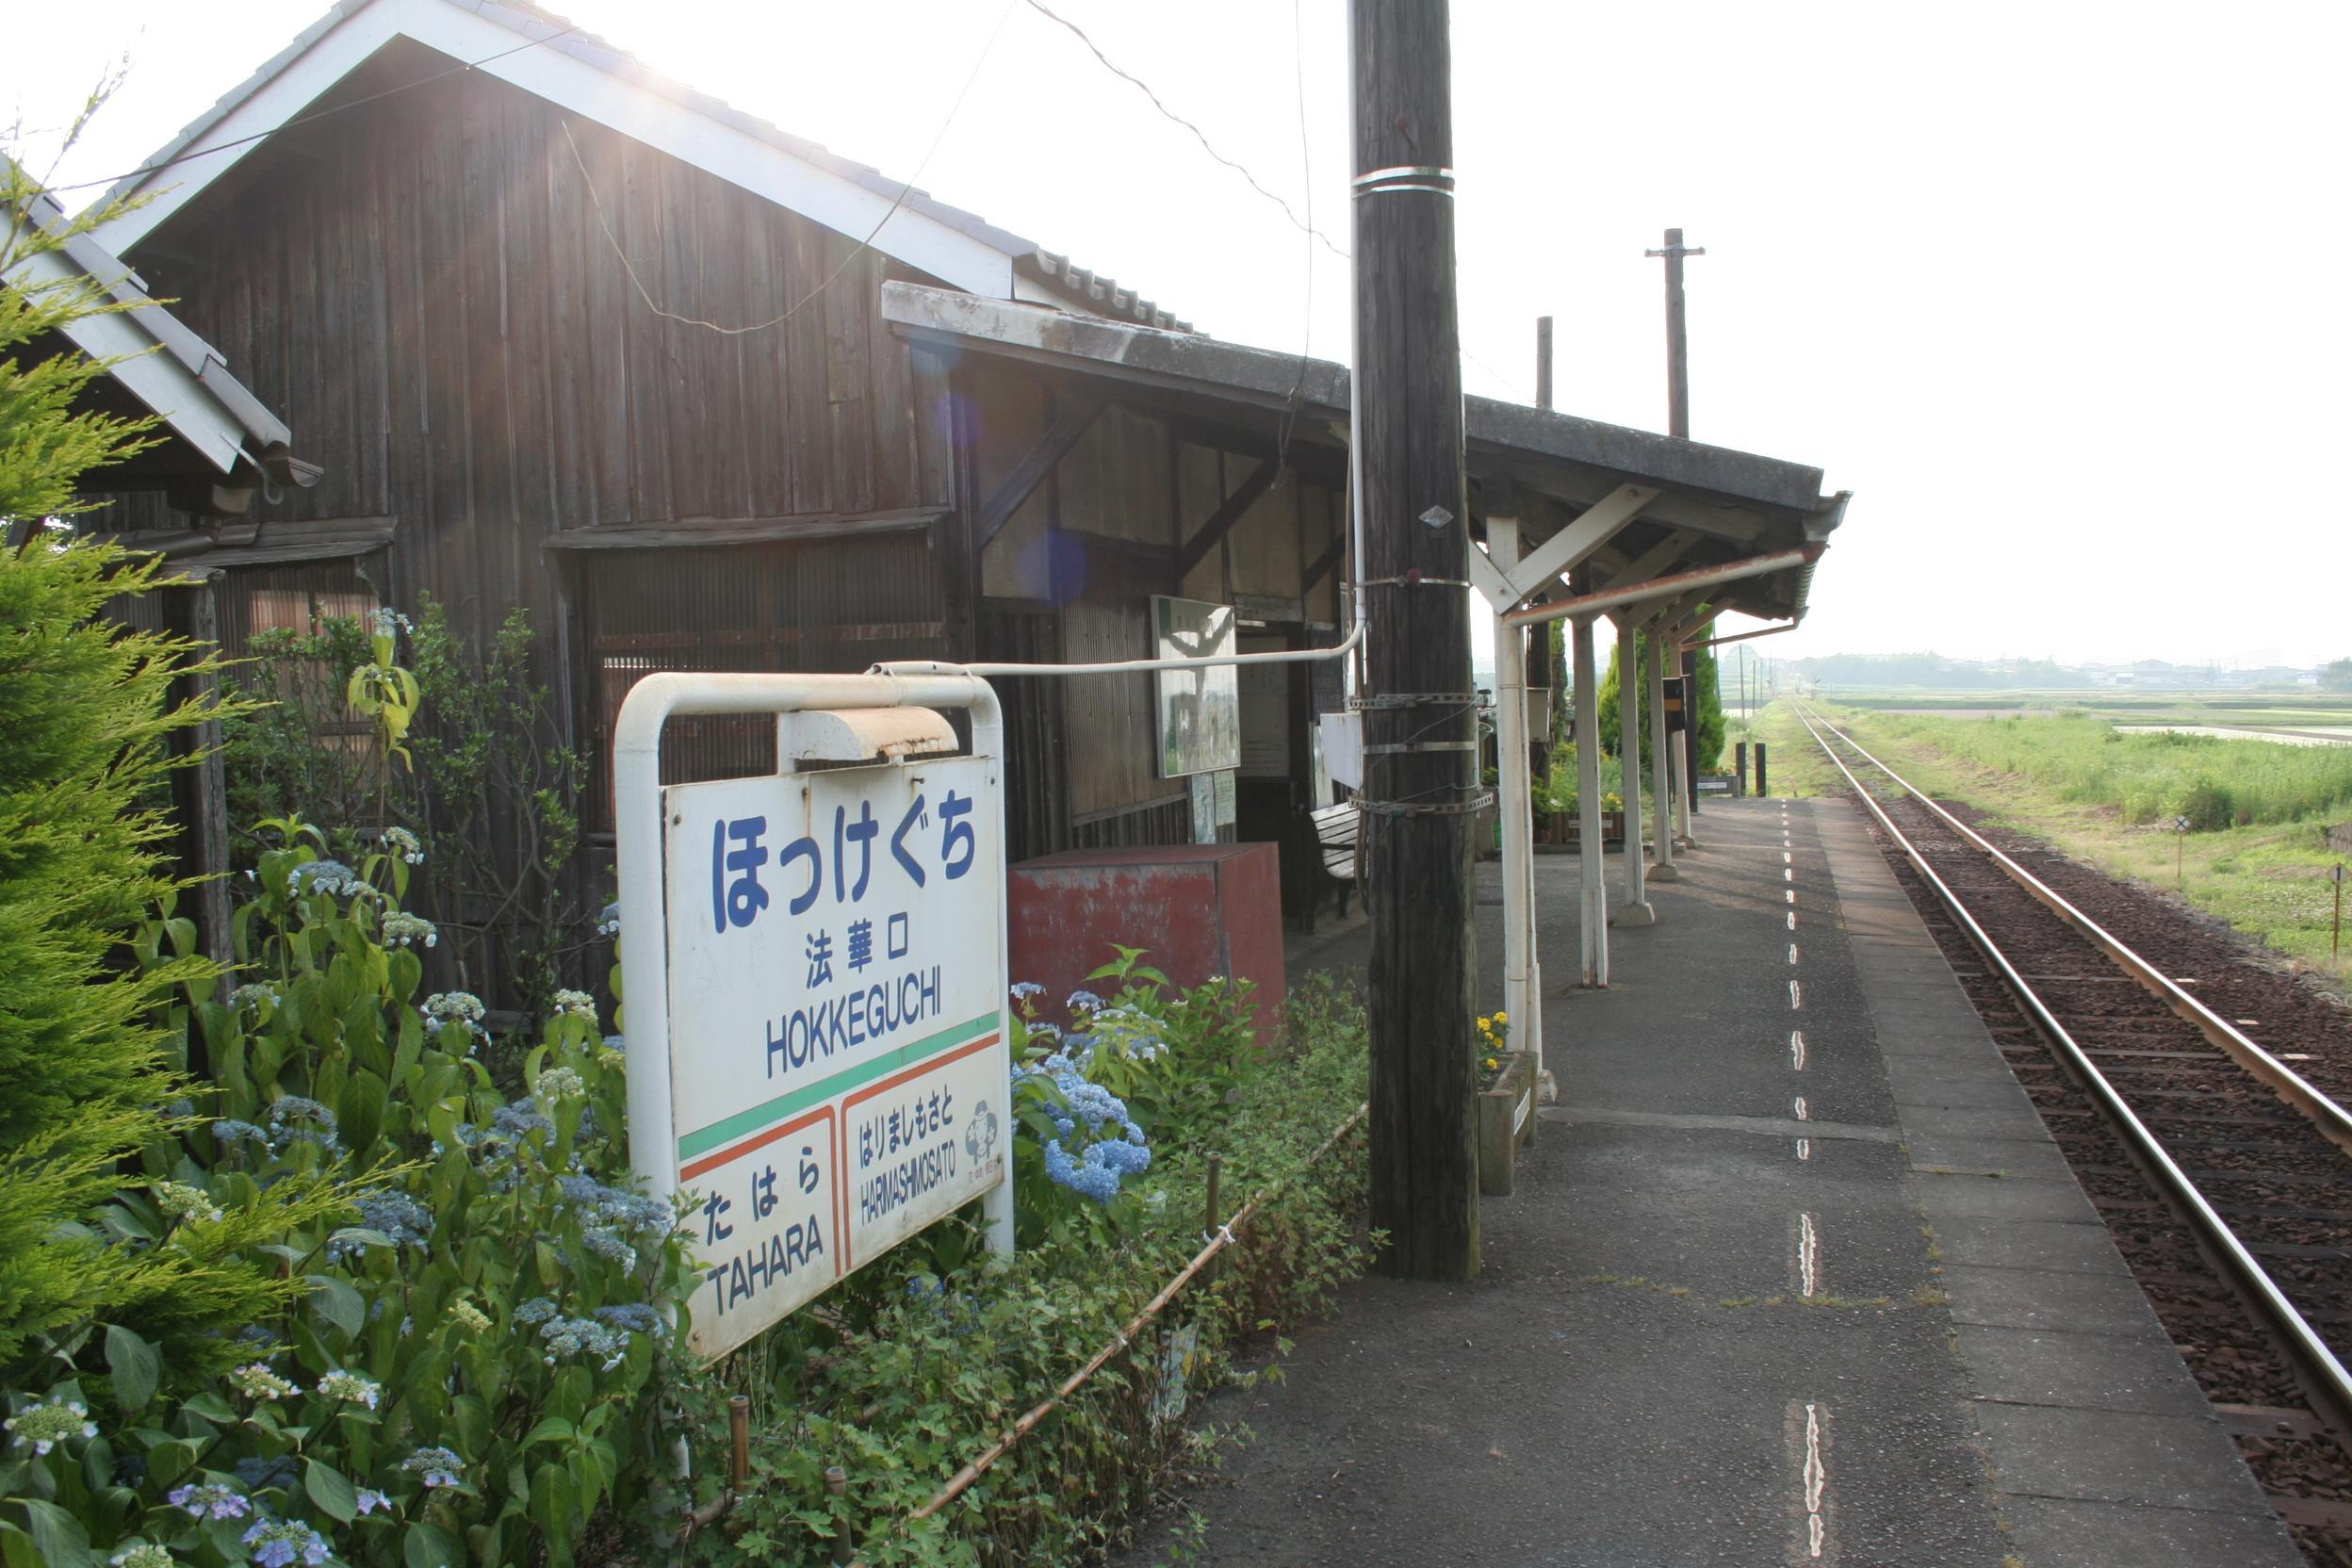 Hokkeguchi_Station_J9_58